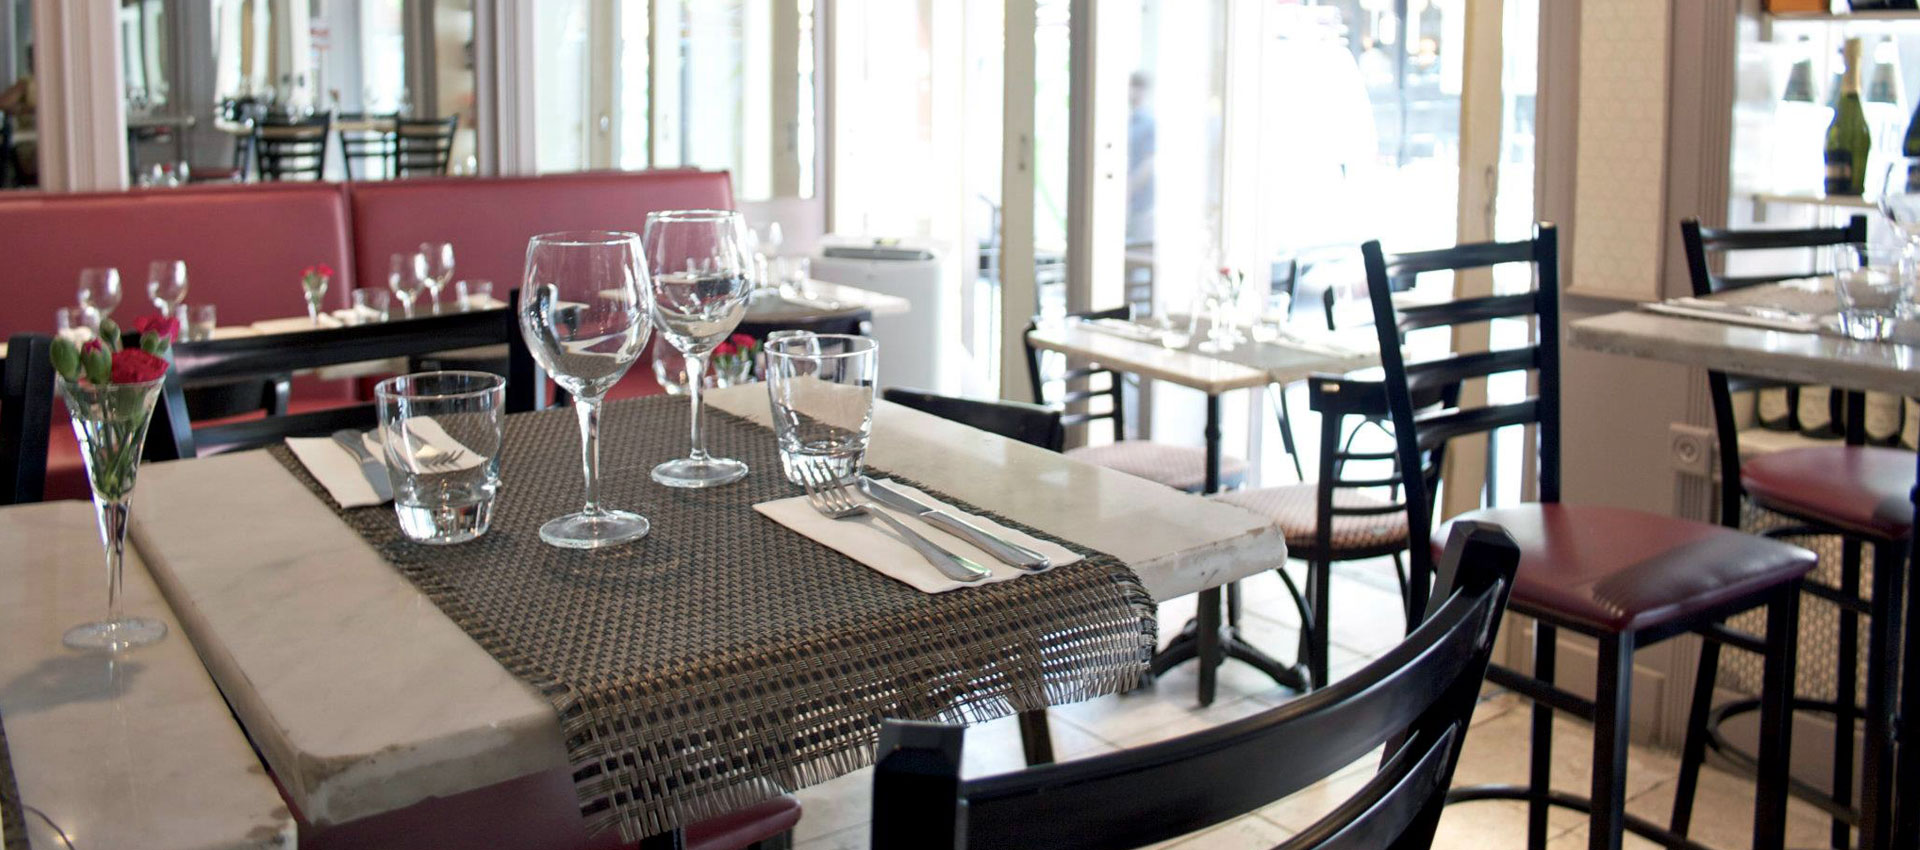 Piccola Cucina Enoteca  Wine bar Prince Street New York